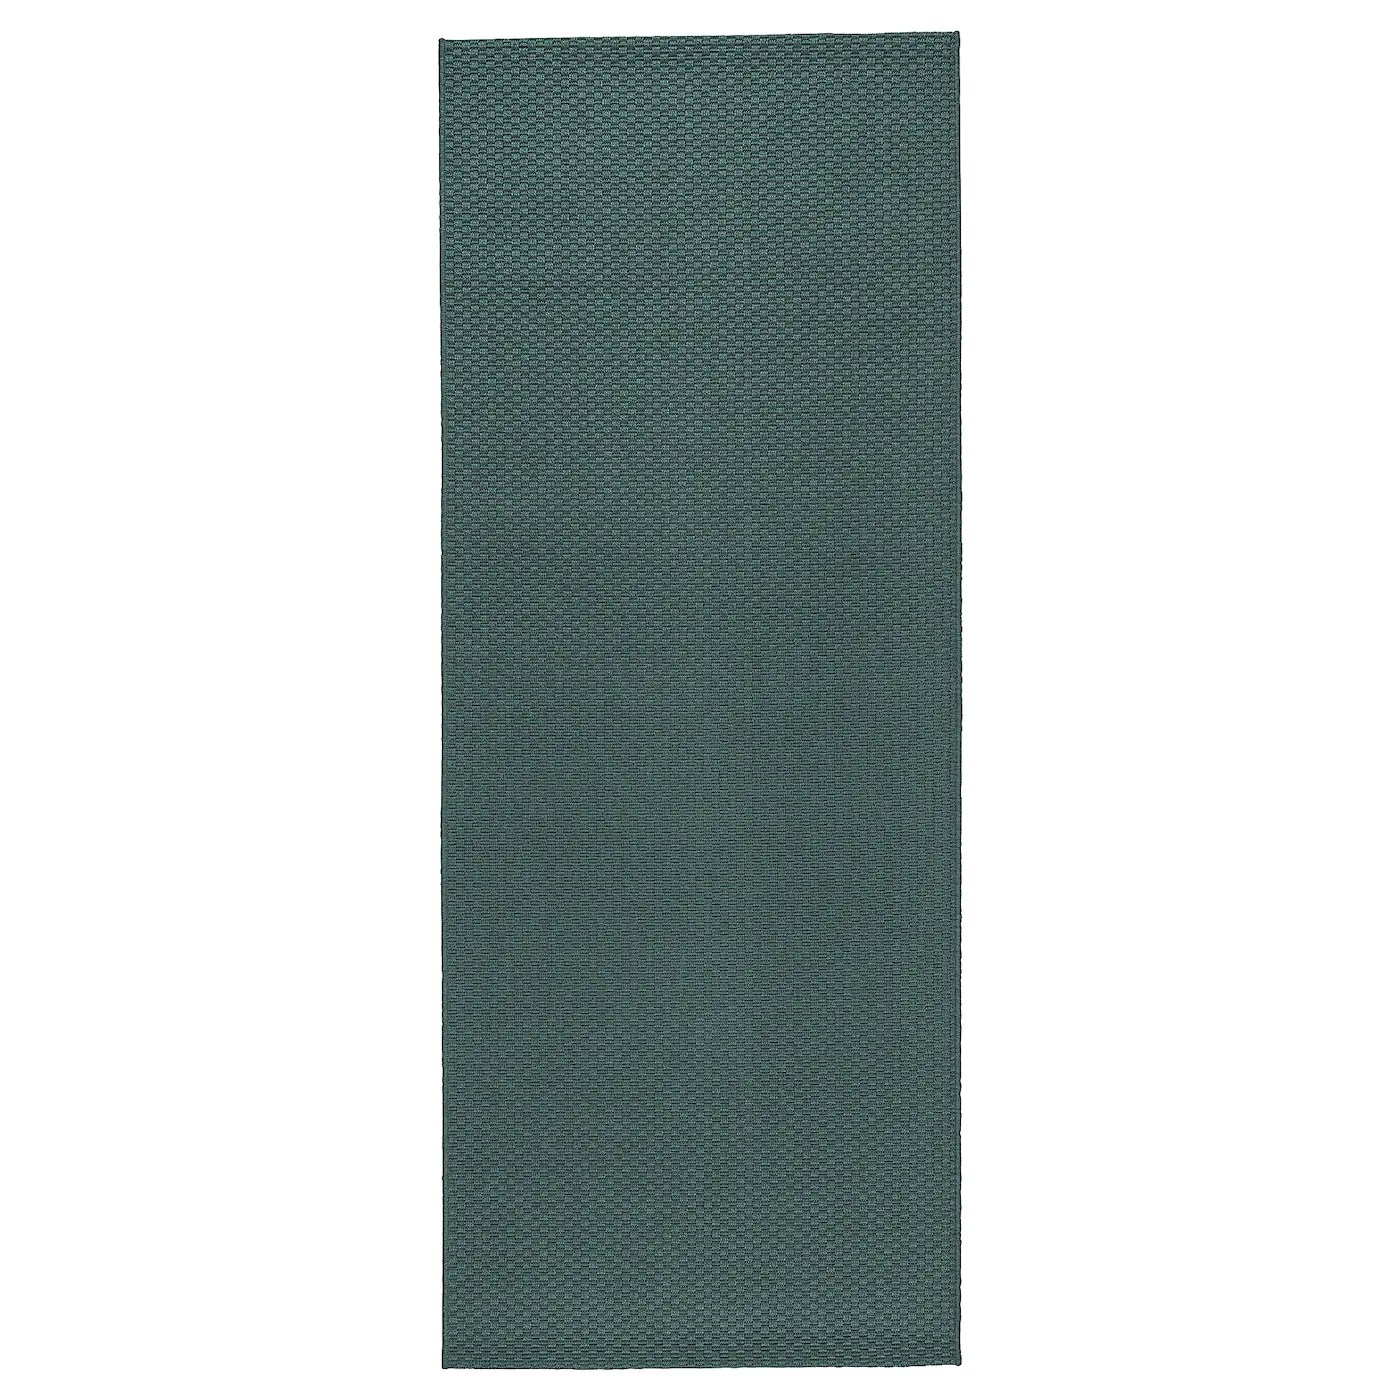 morum teppich flach gewebt drinnen drau grau turkis 80x200 cm